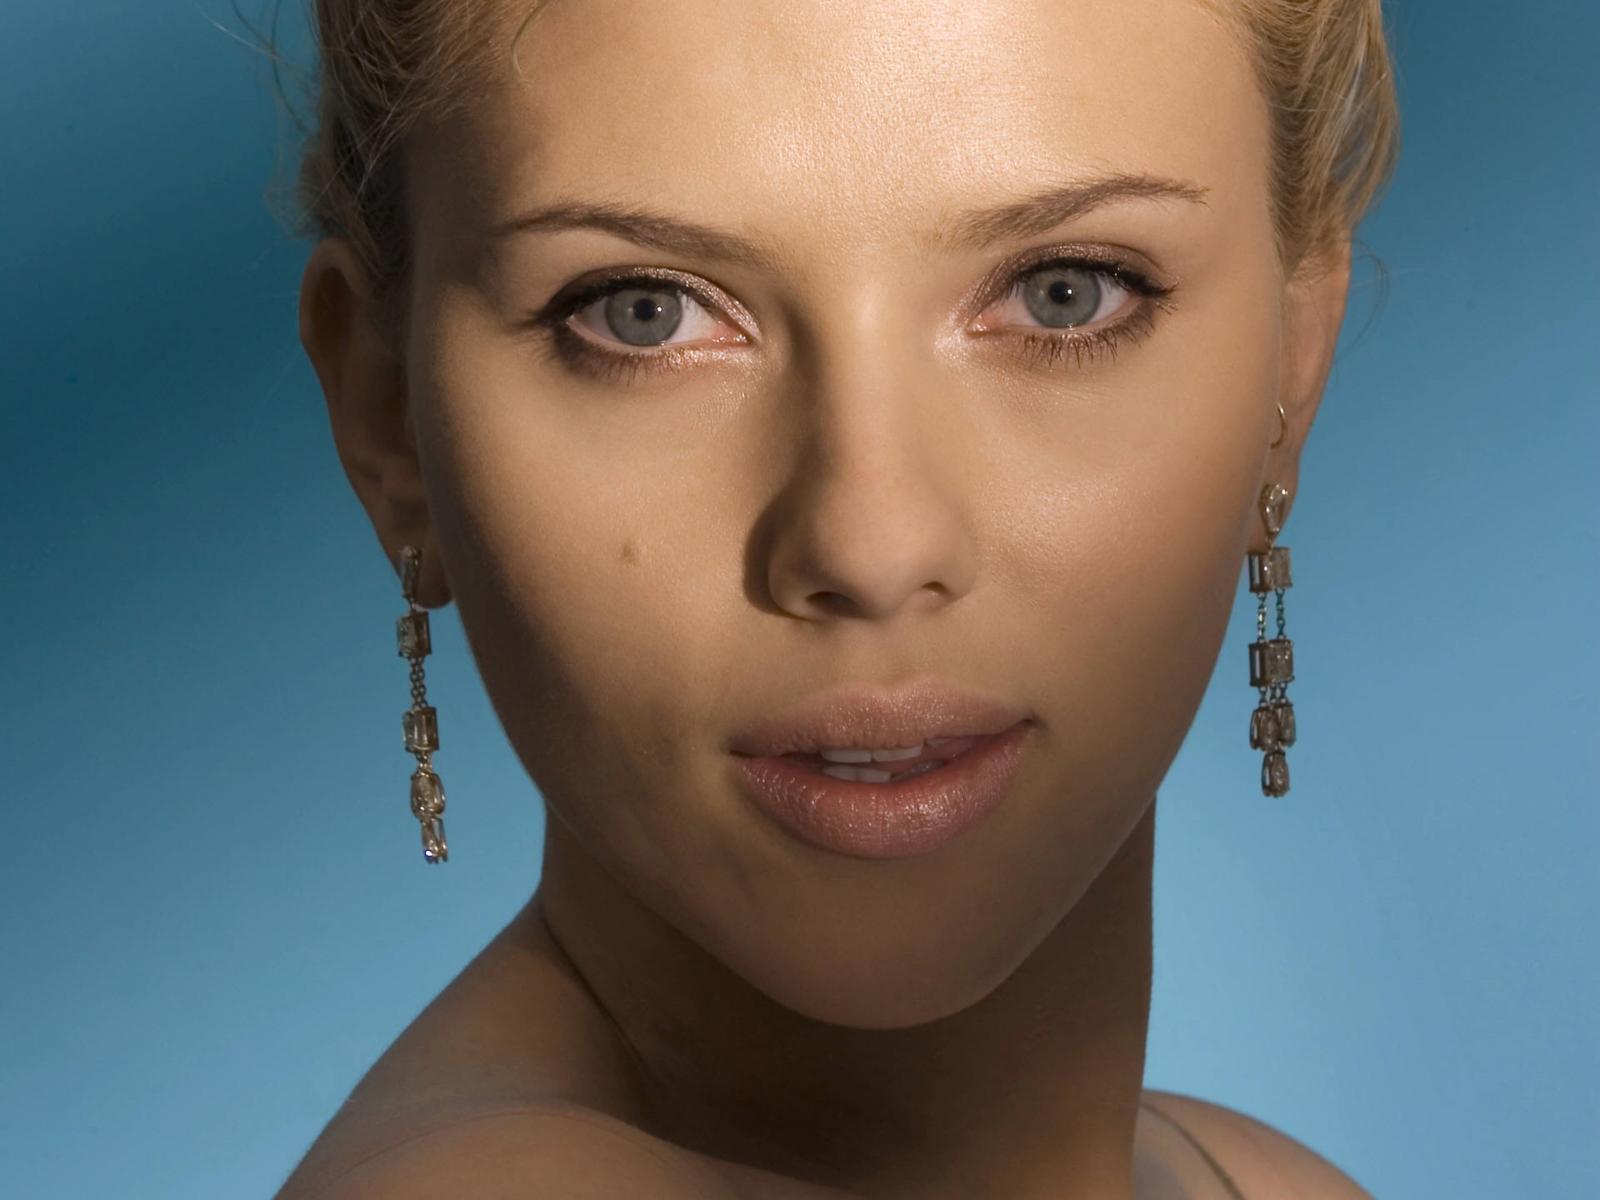 http://2.bp.blogspot.com/-X6FTuoByZ7o/Tr1HvHUa8QI/AAAAAAAAJD4/UTg6y9lZkc0/s1600/Scarlett_Johansson_Wallpapers_lips_hot.jpg